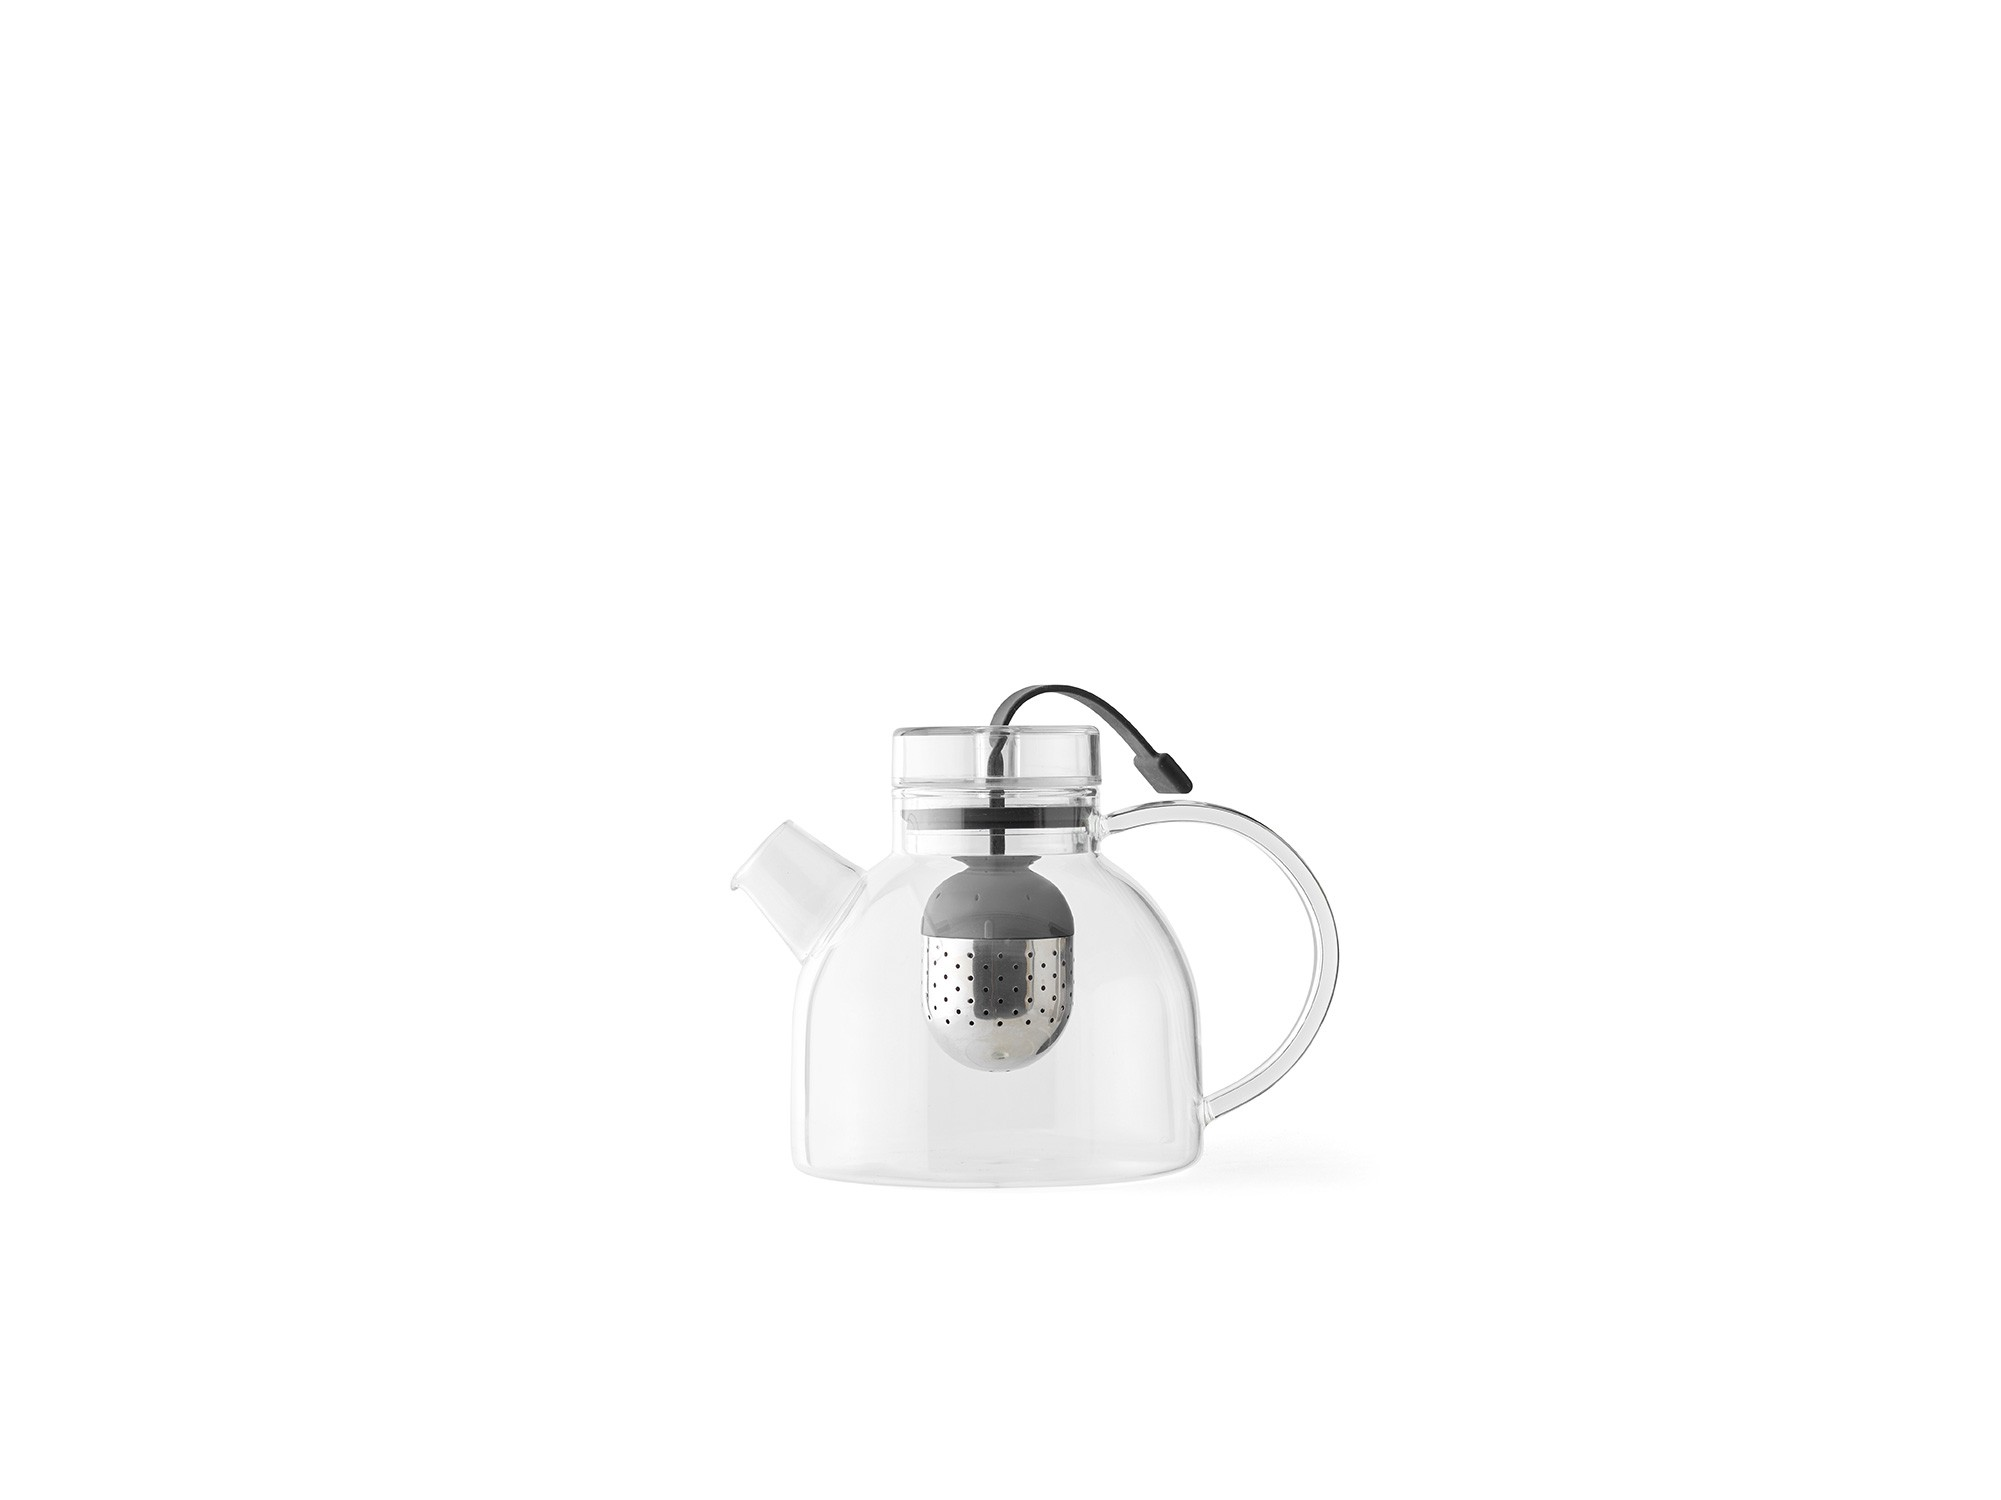 menu kettle teapot 0 7 5l teekanne mit integriertem tee ei. Black Bedroom Furniture Sets. Home Design Ideas